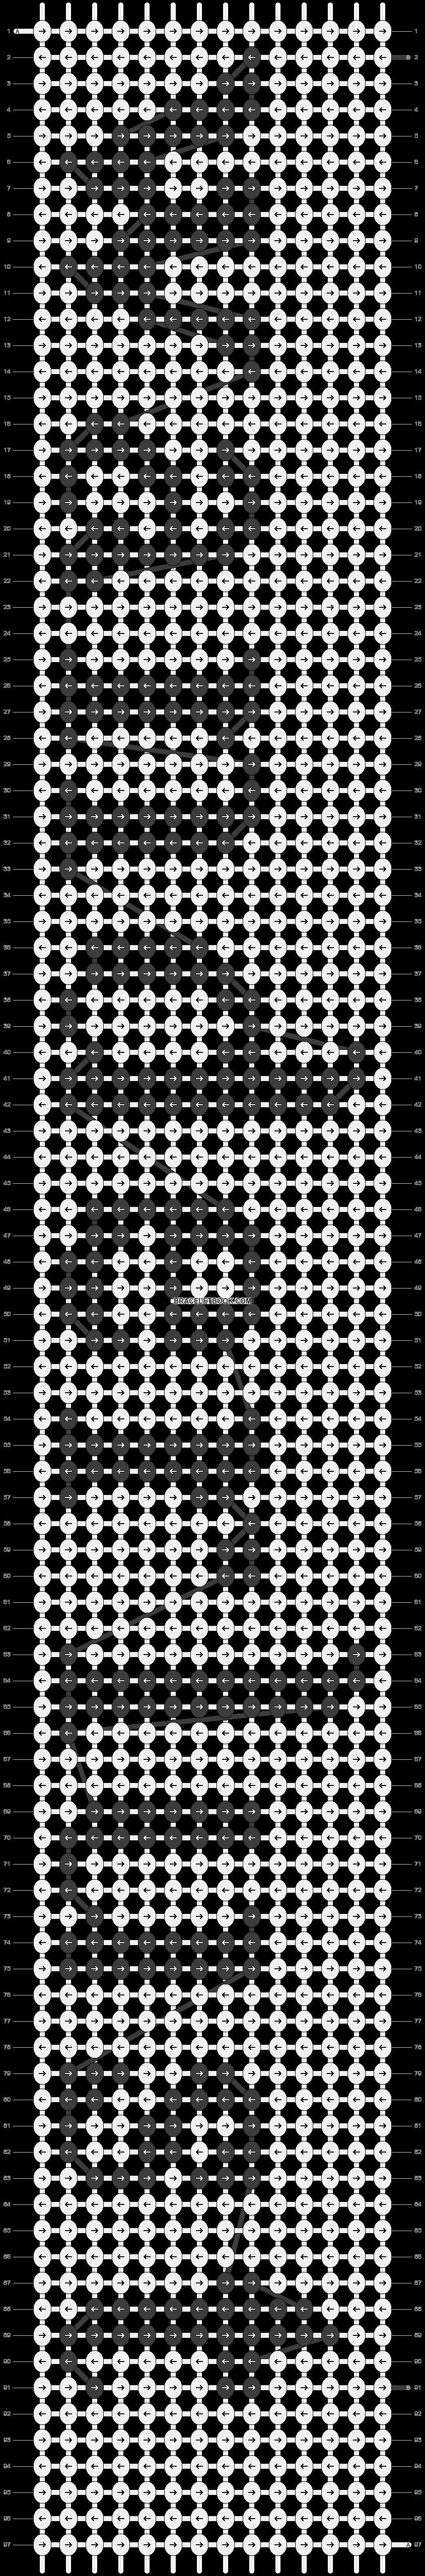 Alpha pattern #7778 pattern